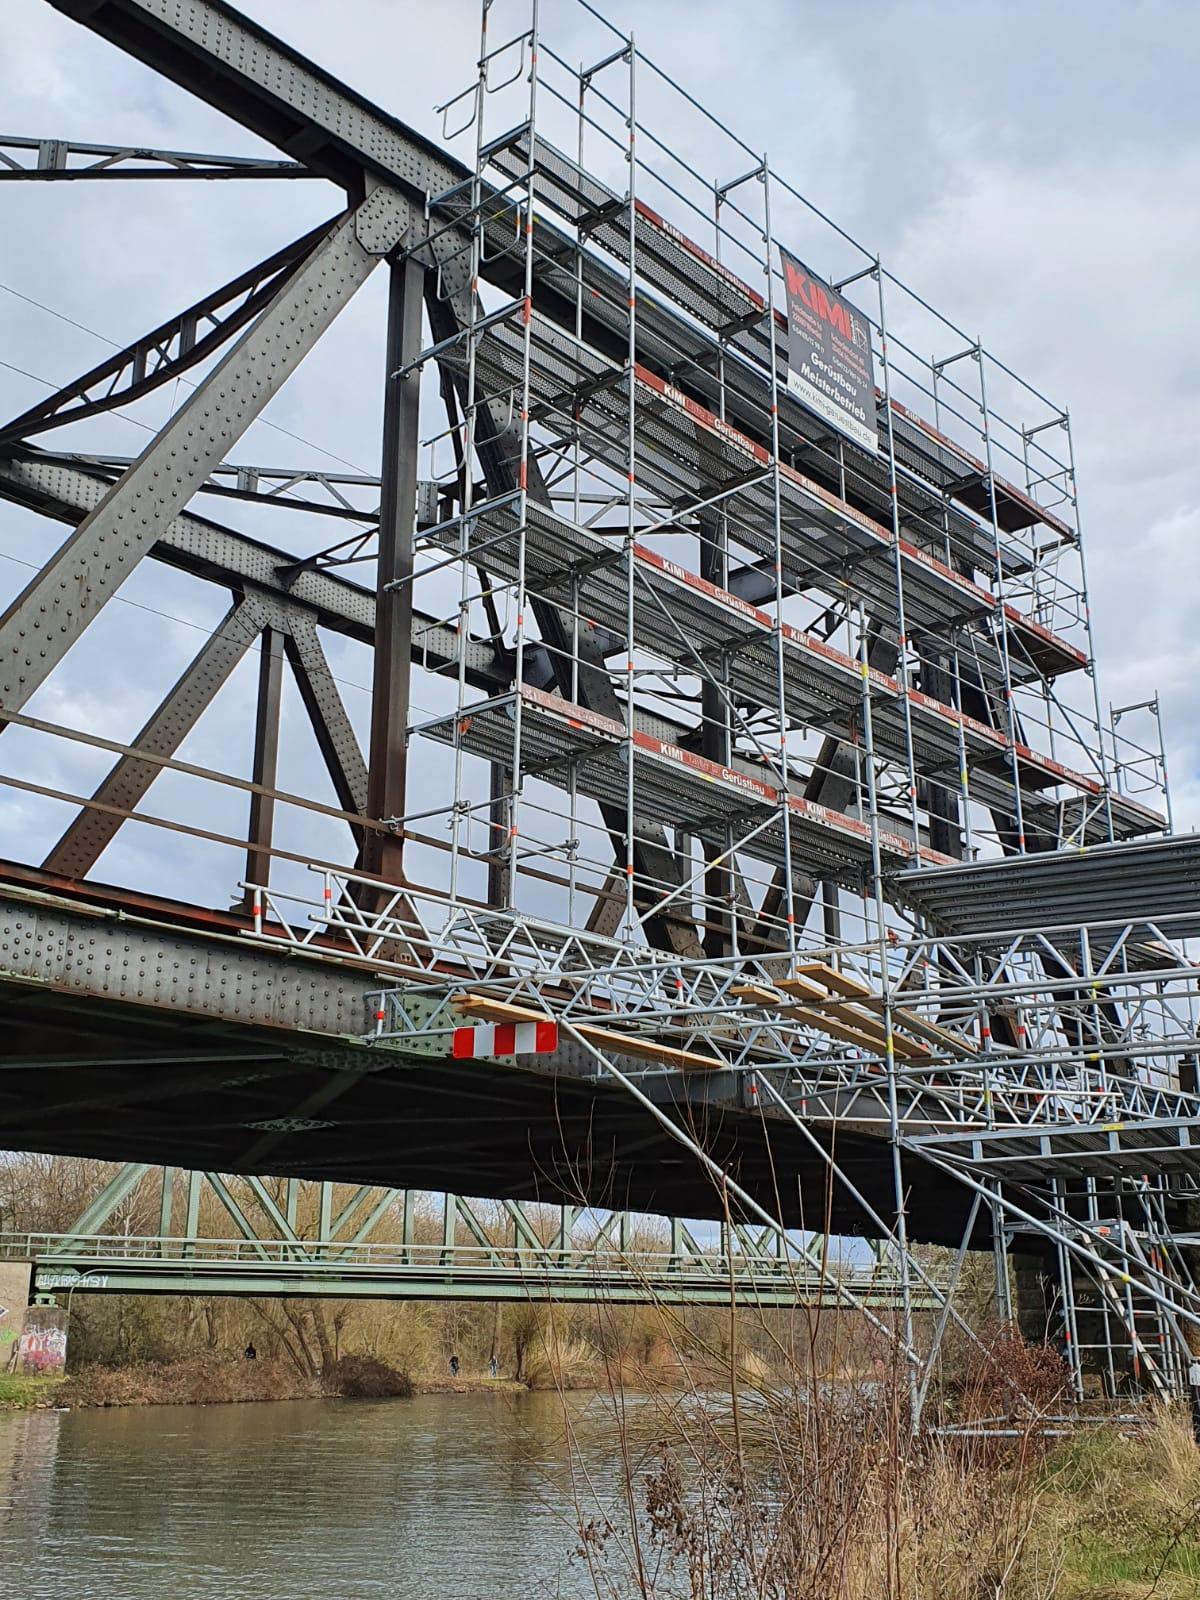 Kimi-Geruestbau-Trockenbau-Fassadengeruest-Wedel-Uetersen-Hamburg-Stahlbau-Schröder-Bild-4